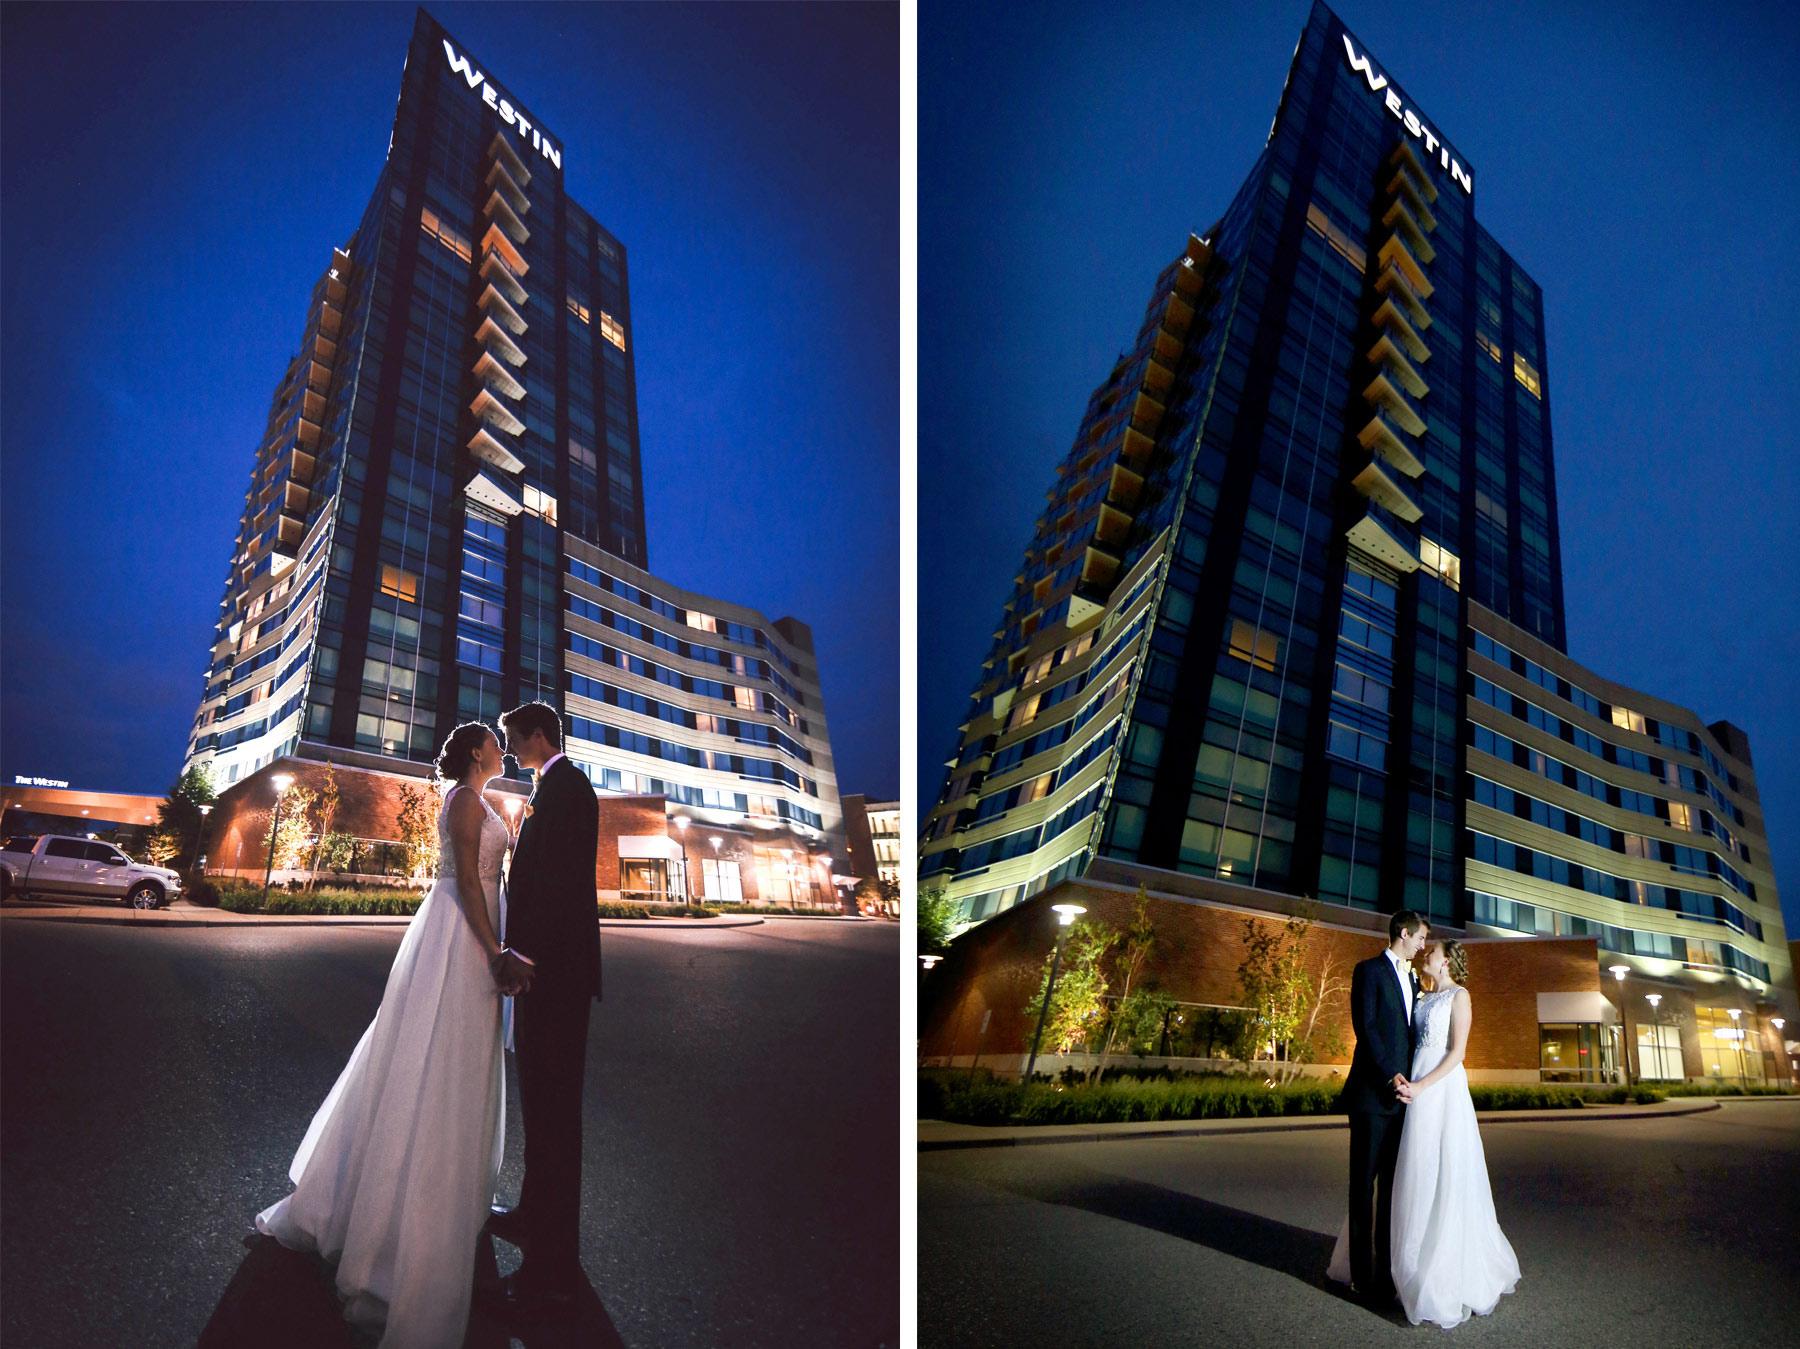 18-Minneapolis-Minnesota-Wedding-Photography-by-Vick-Photography-Edina-Westin-Hotel-Night-Photography-Grace-&-Nick.jpg